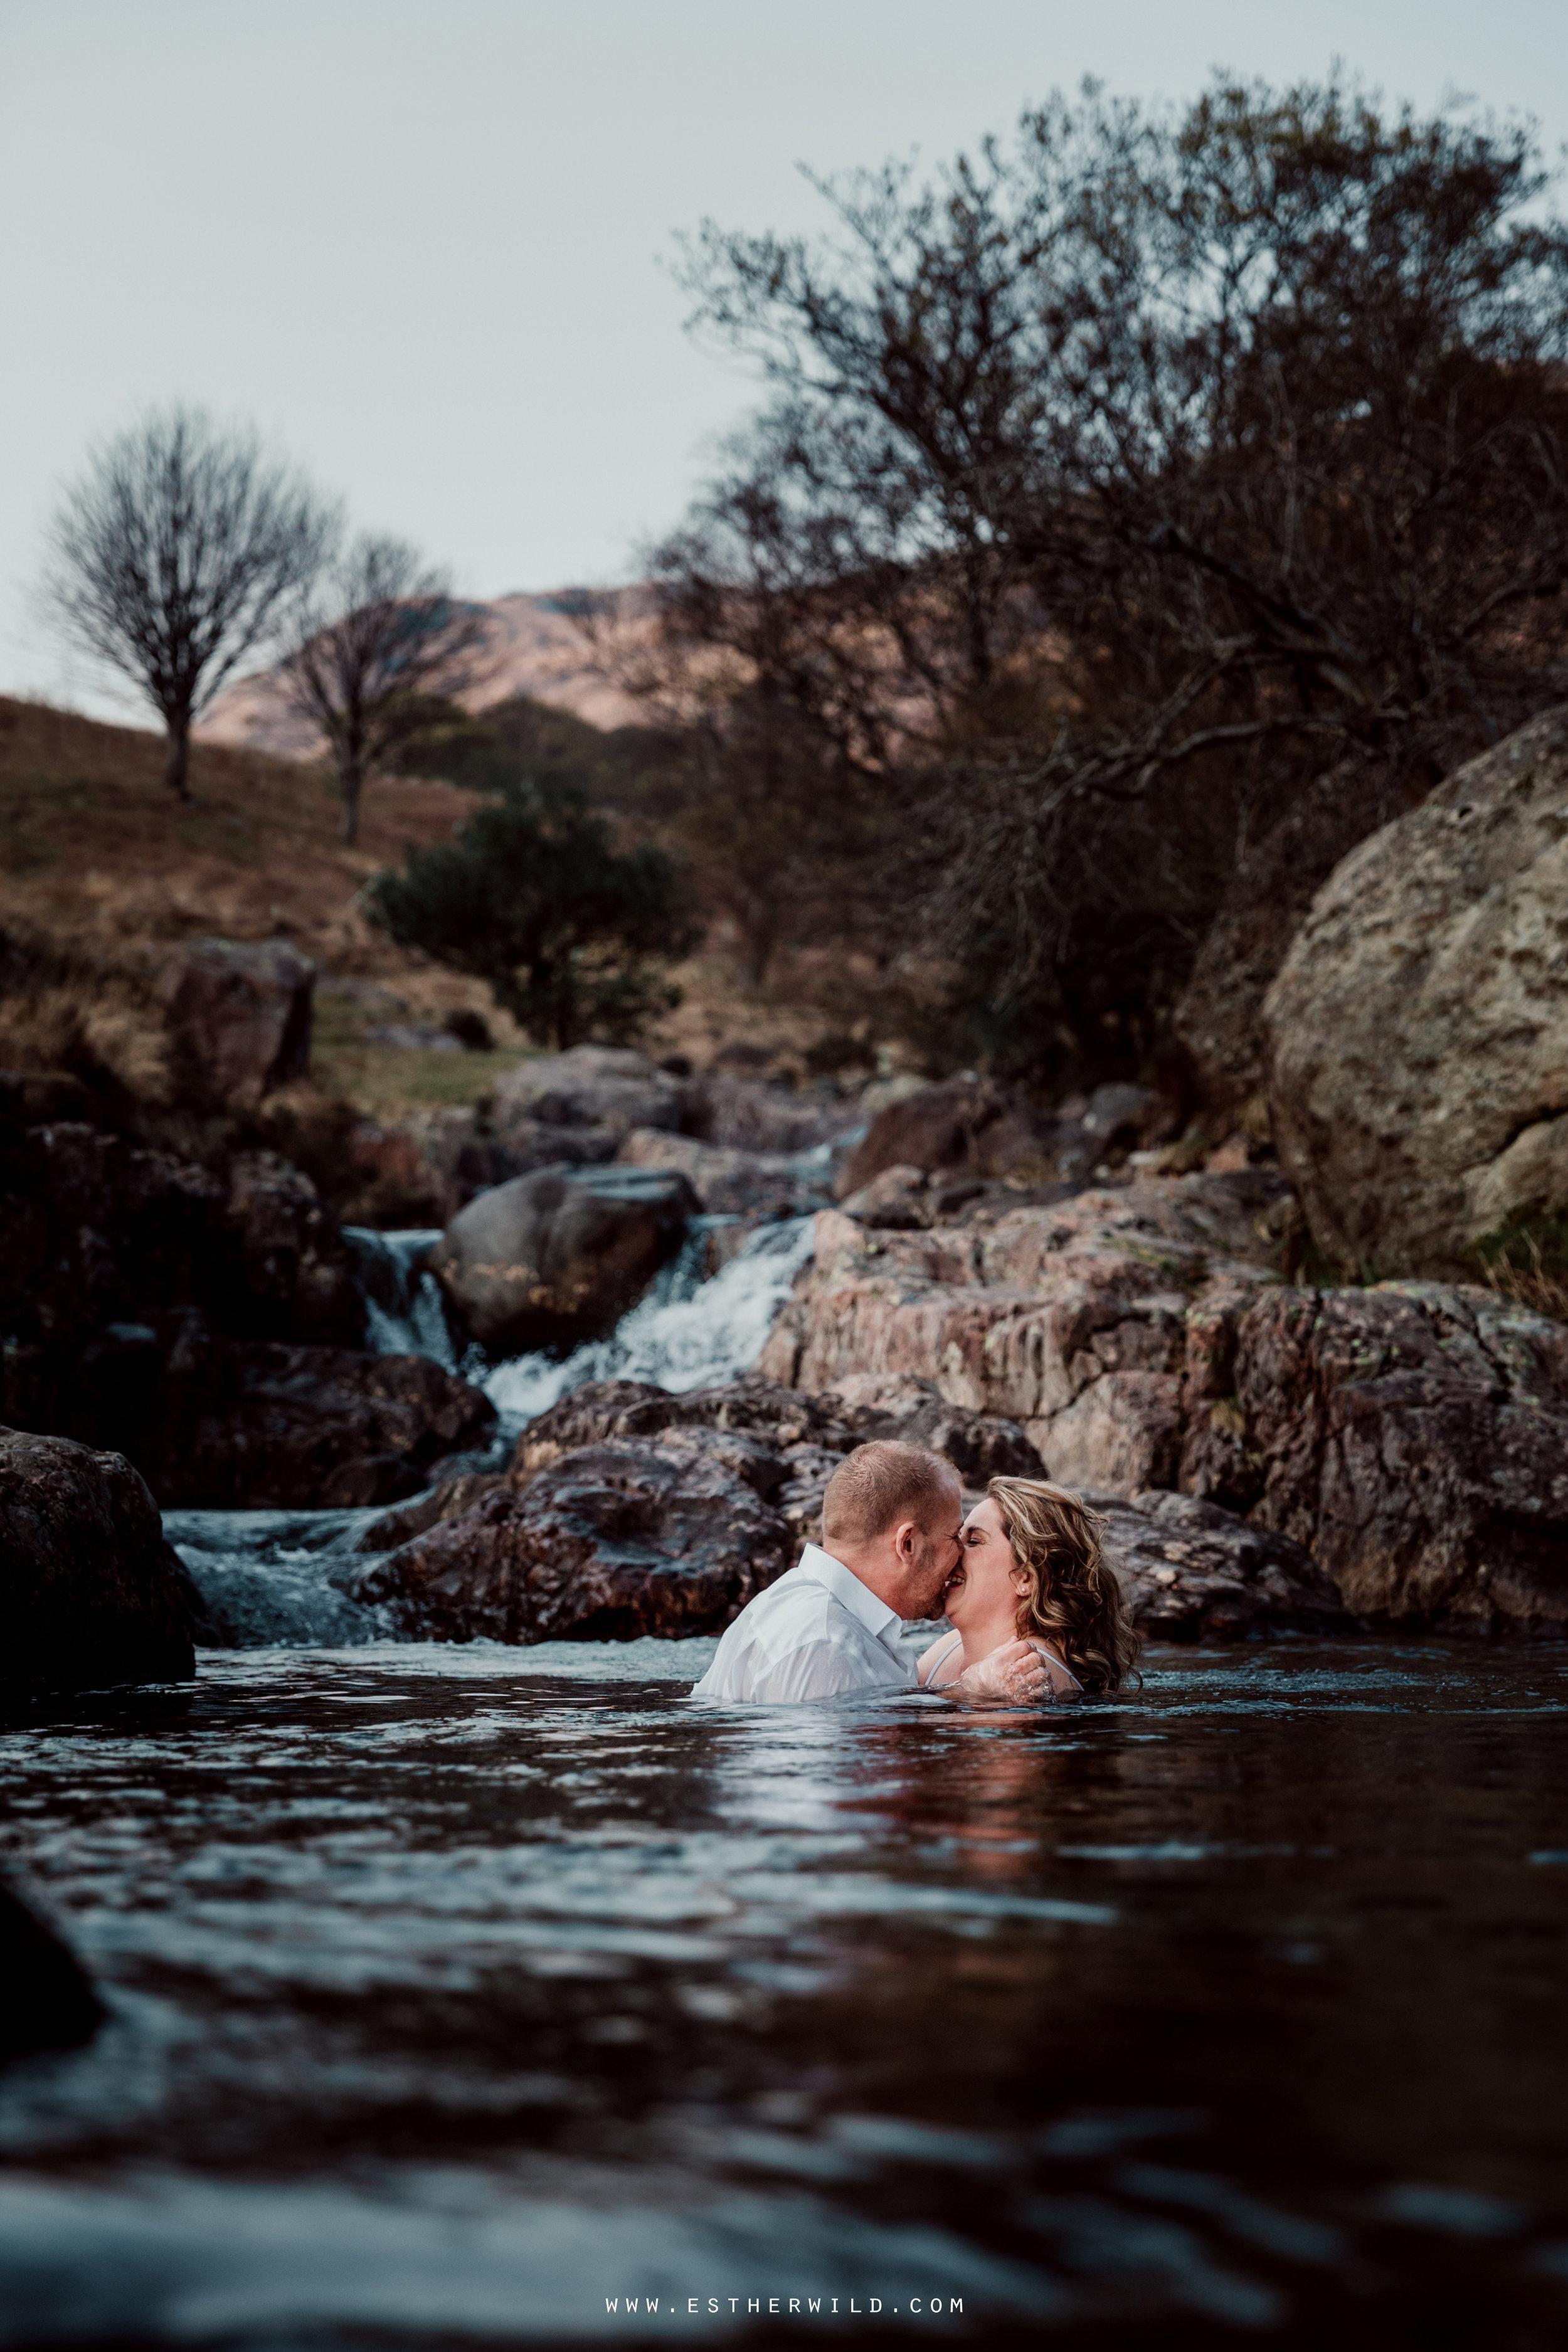 Cumbria_Lake_District_Wasdale_Wedding_Photographer_Destination_Engagement_Anniversary_Esther_Wild_IMG_4456.jpg